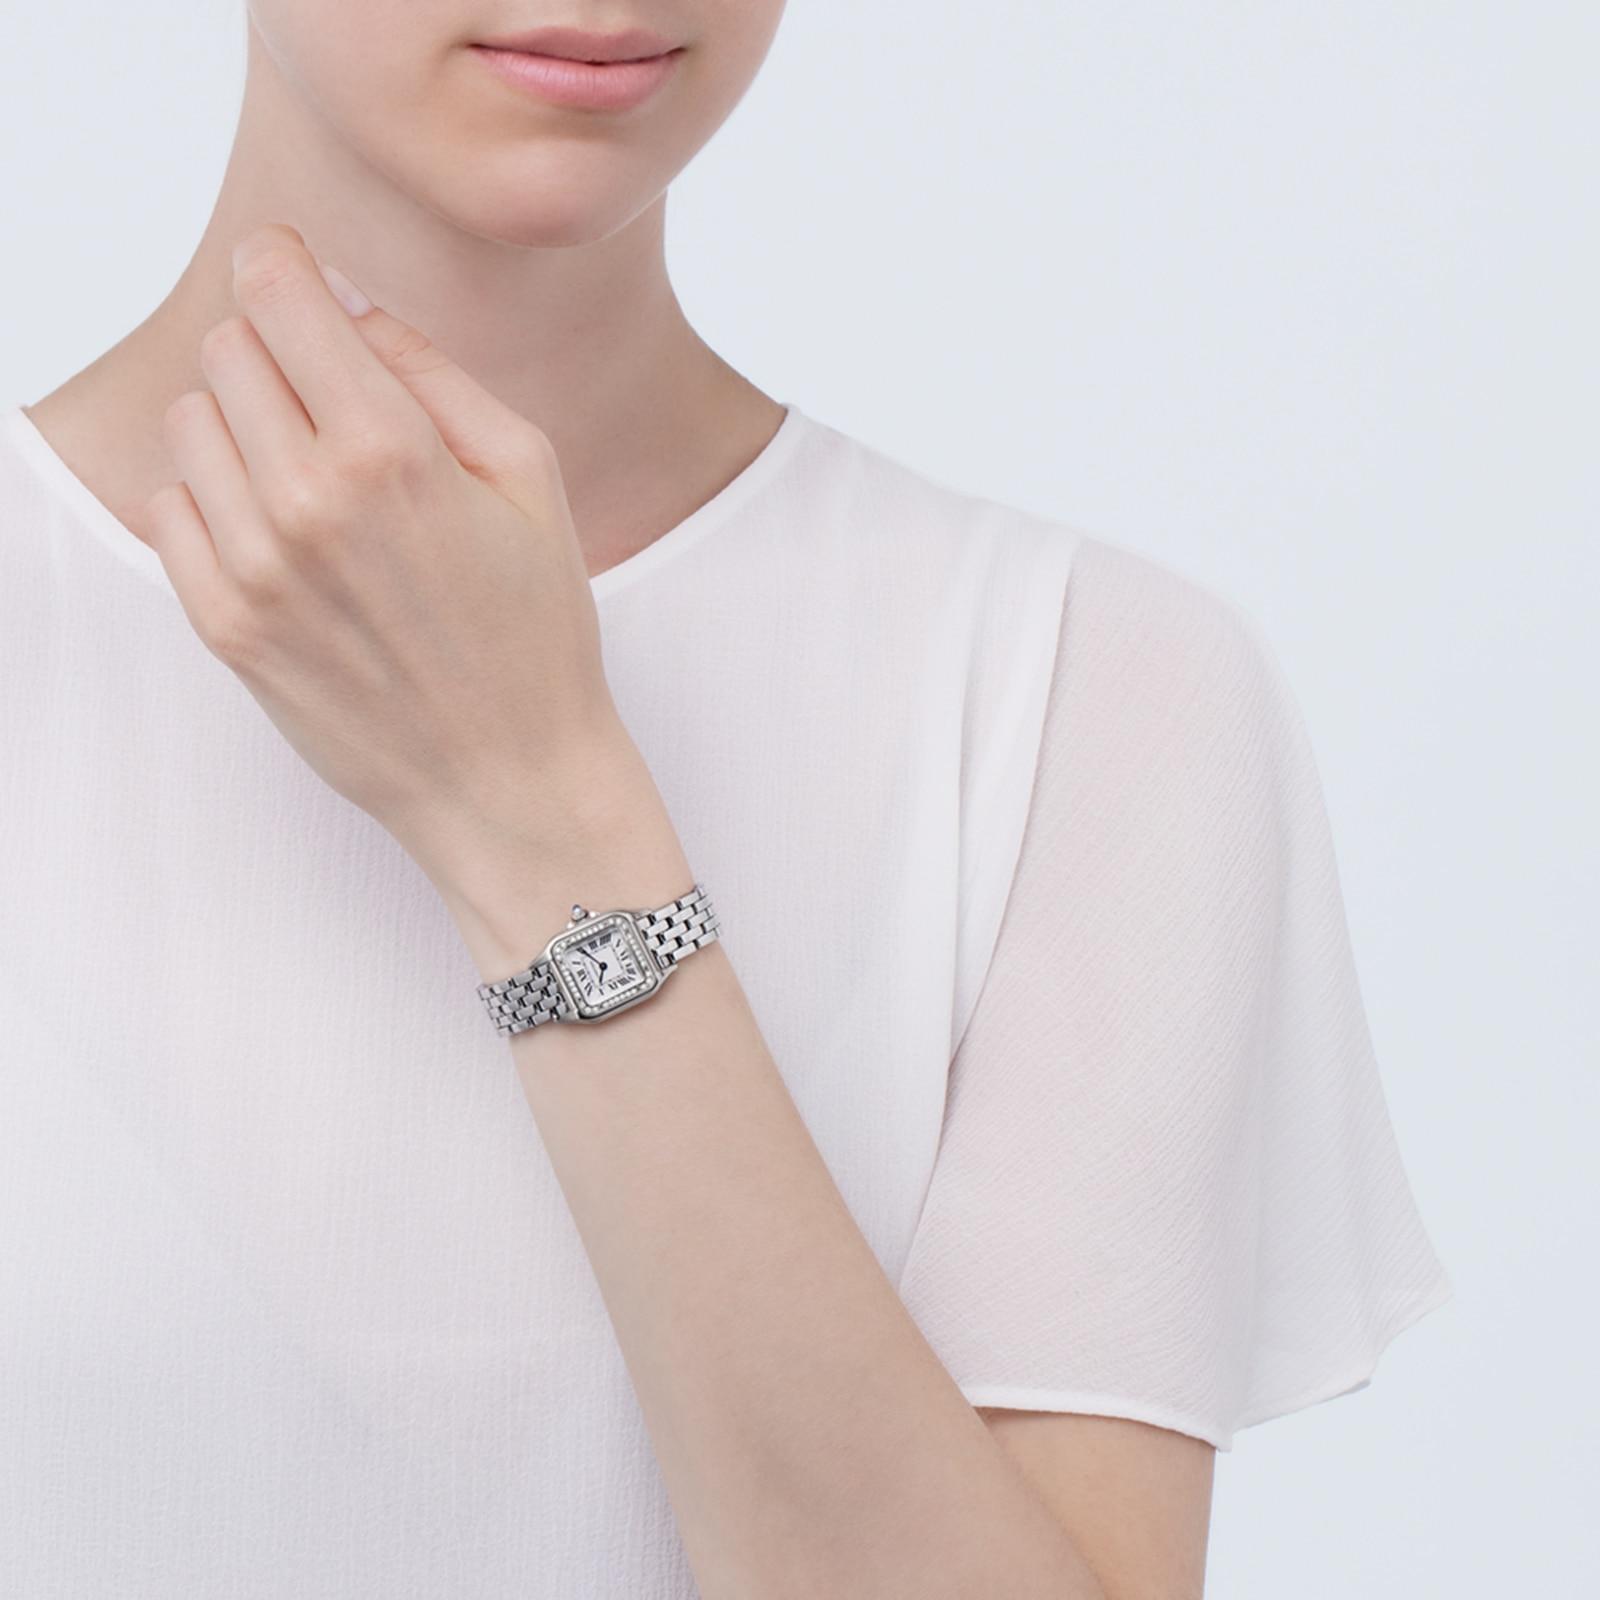 Cartier Panthère de Cartier watch, Small model, steel, diamonds